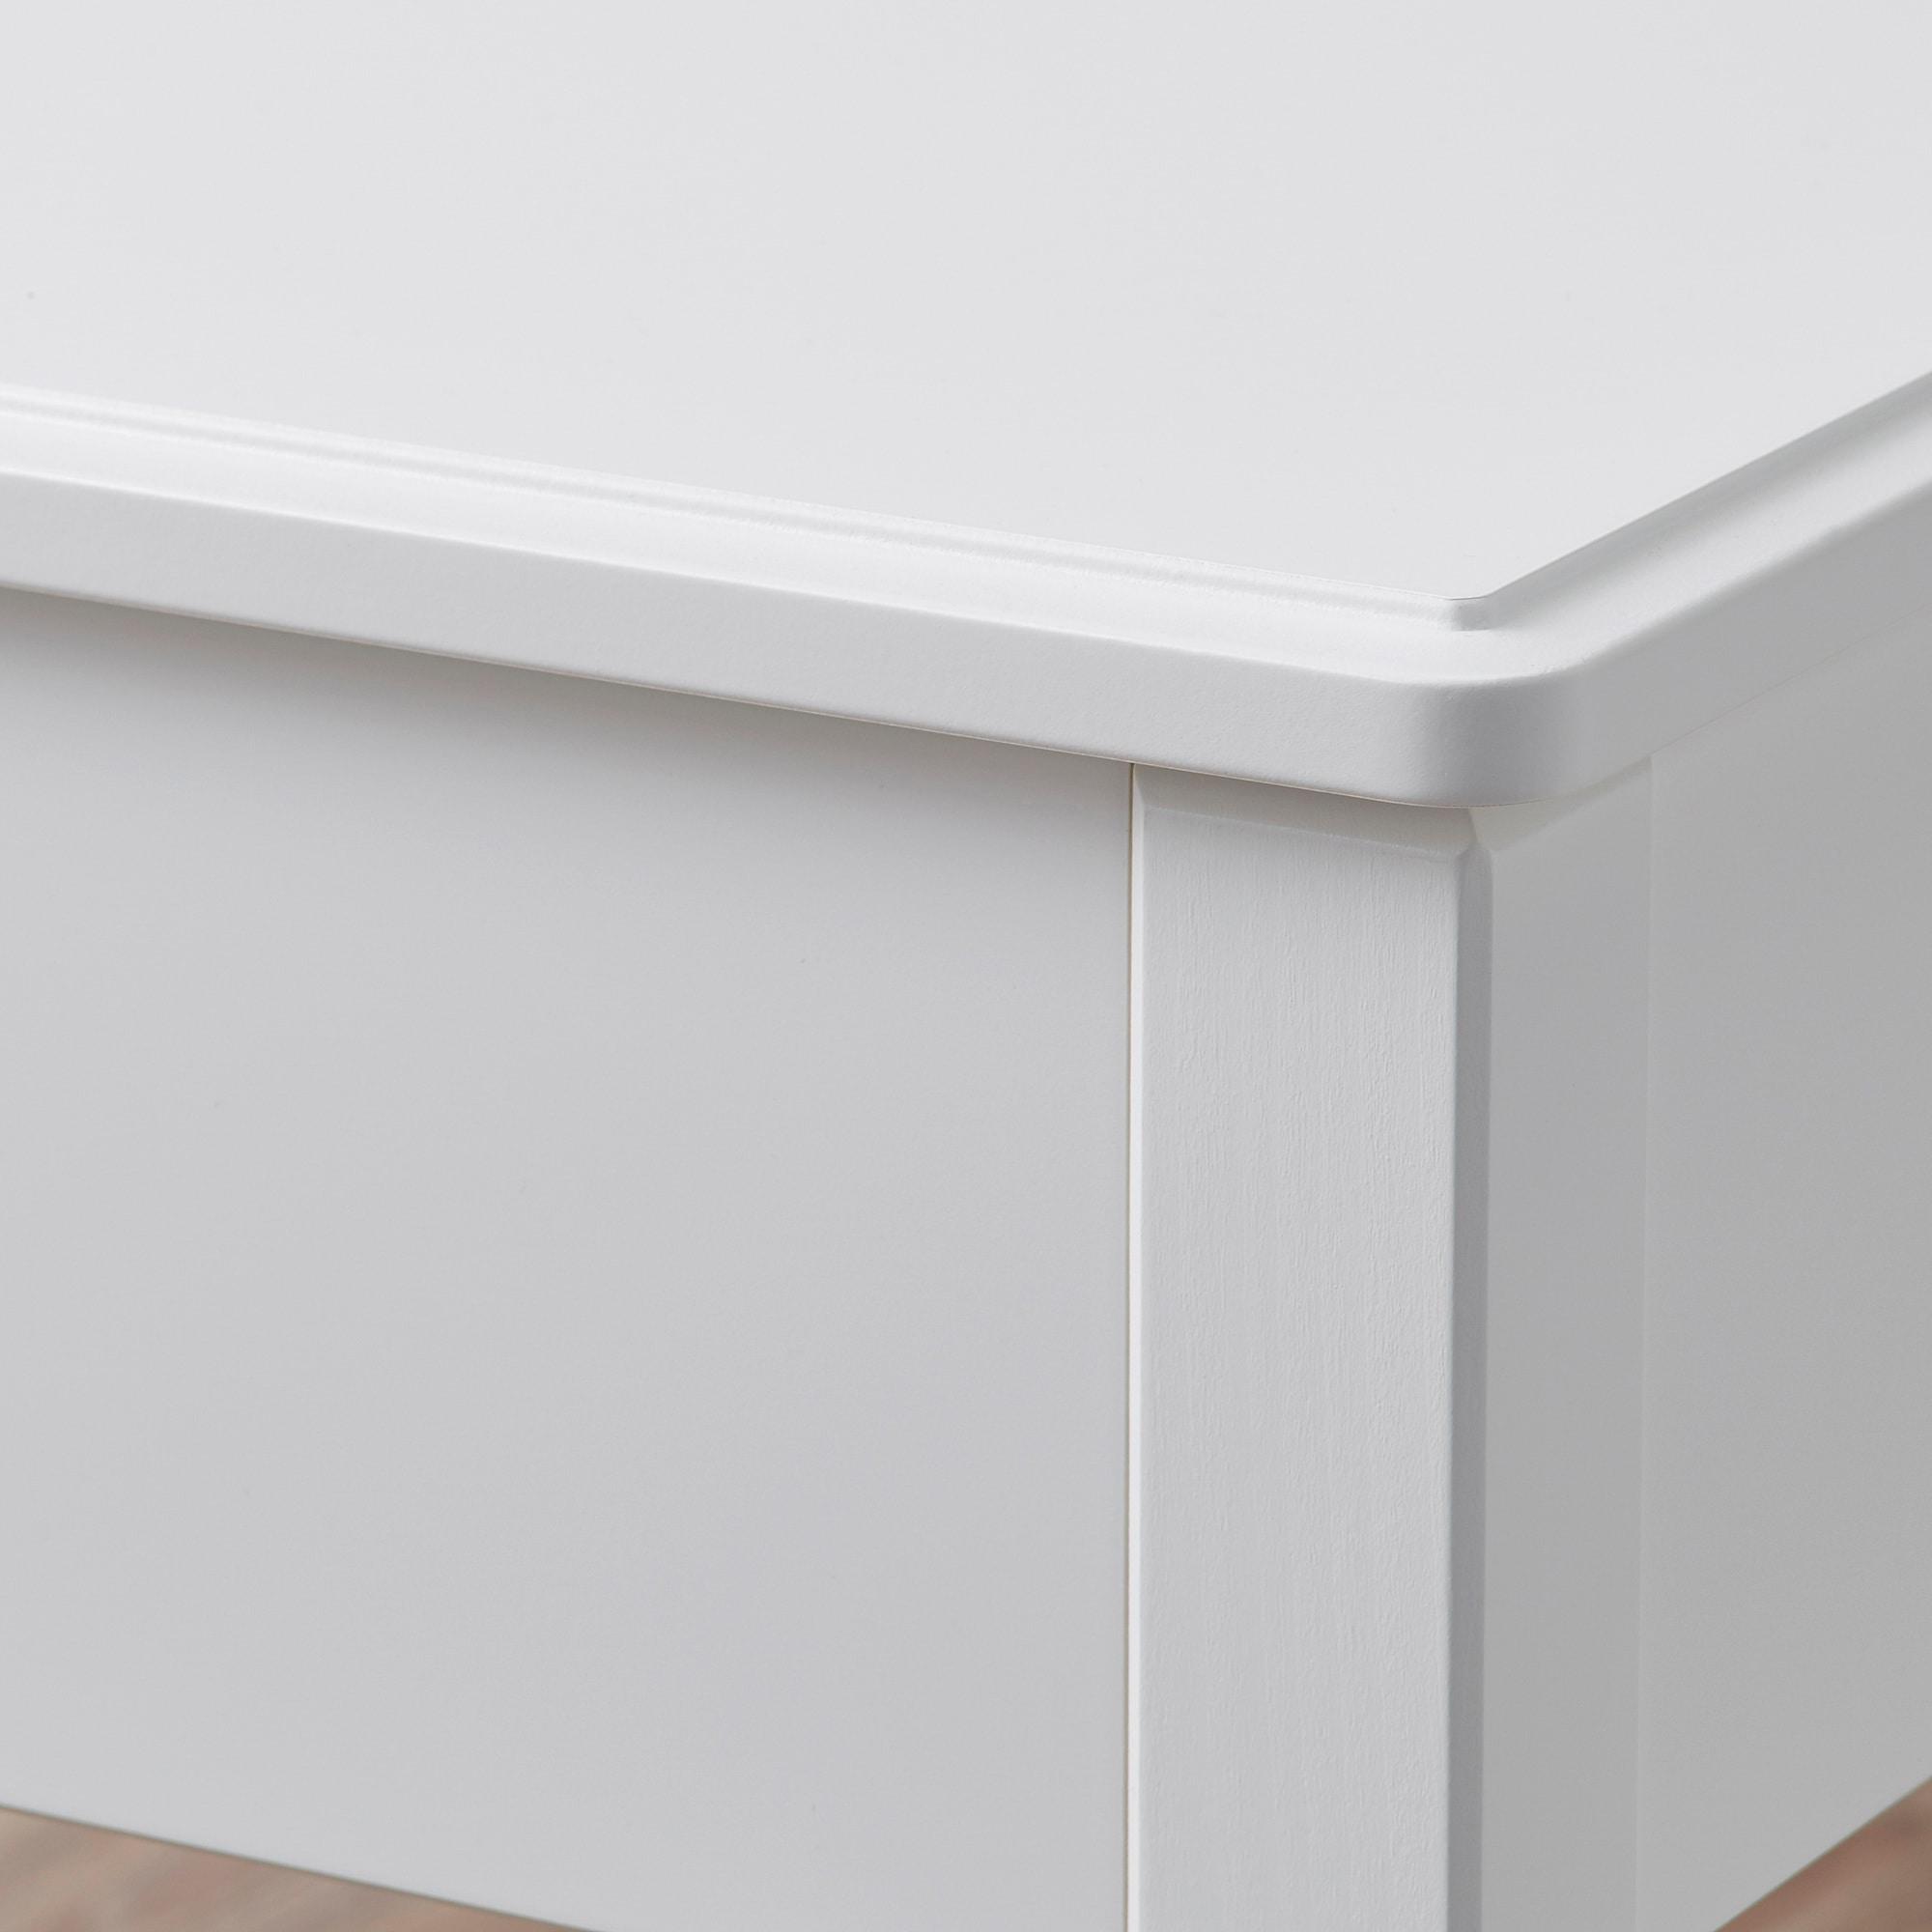 Tyssedal Tabouret Avec Rangement Blanc Ikea